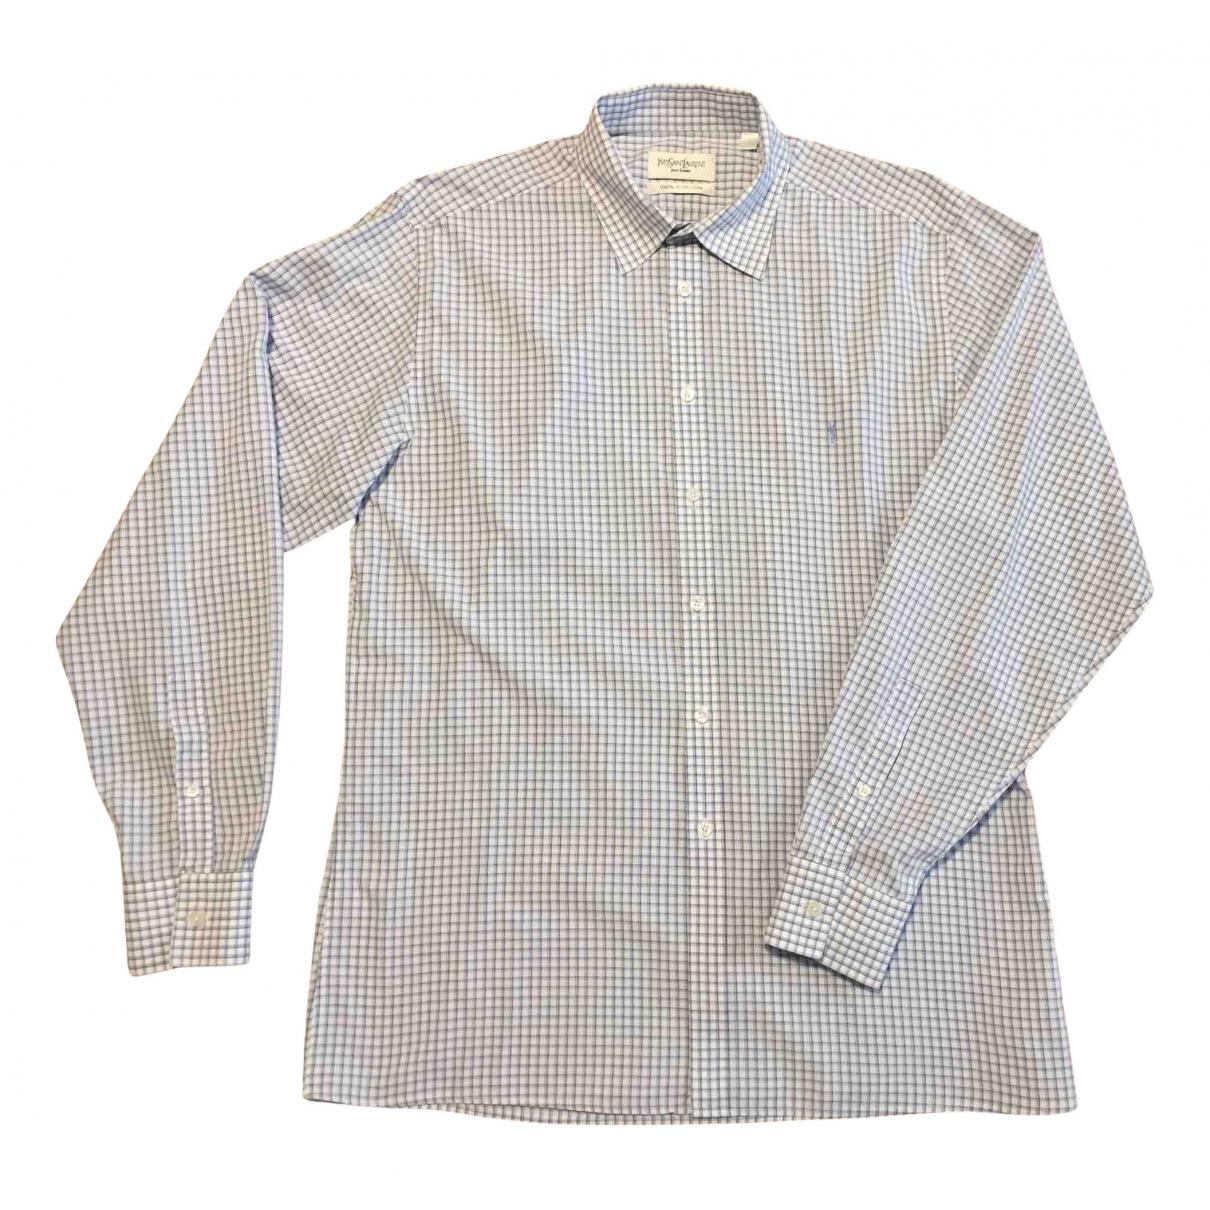 Yves Saint Laurent N White Cotton Shirts for Men L International